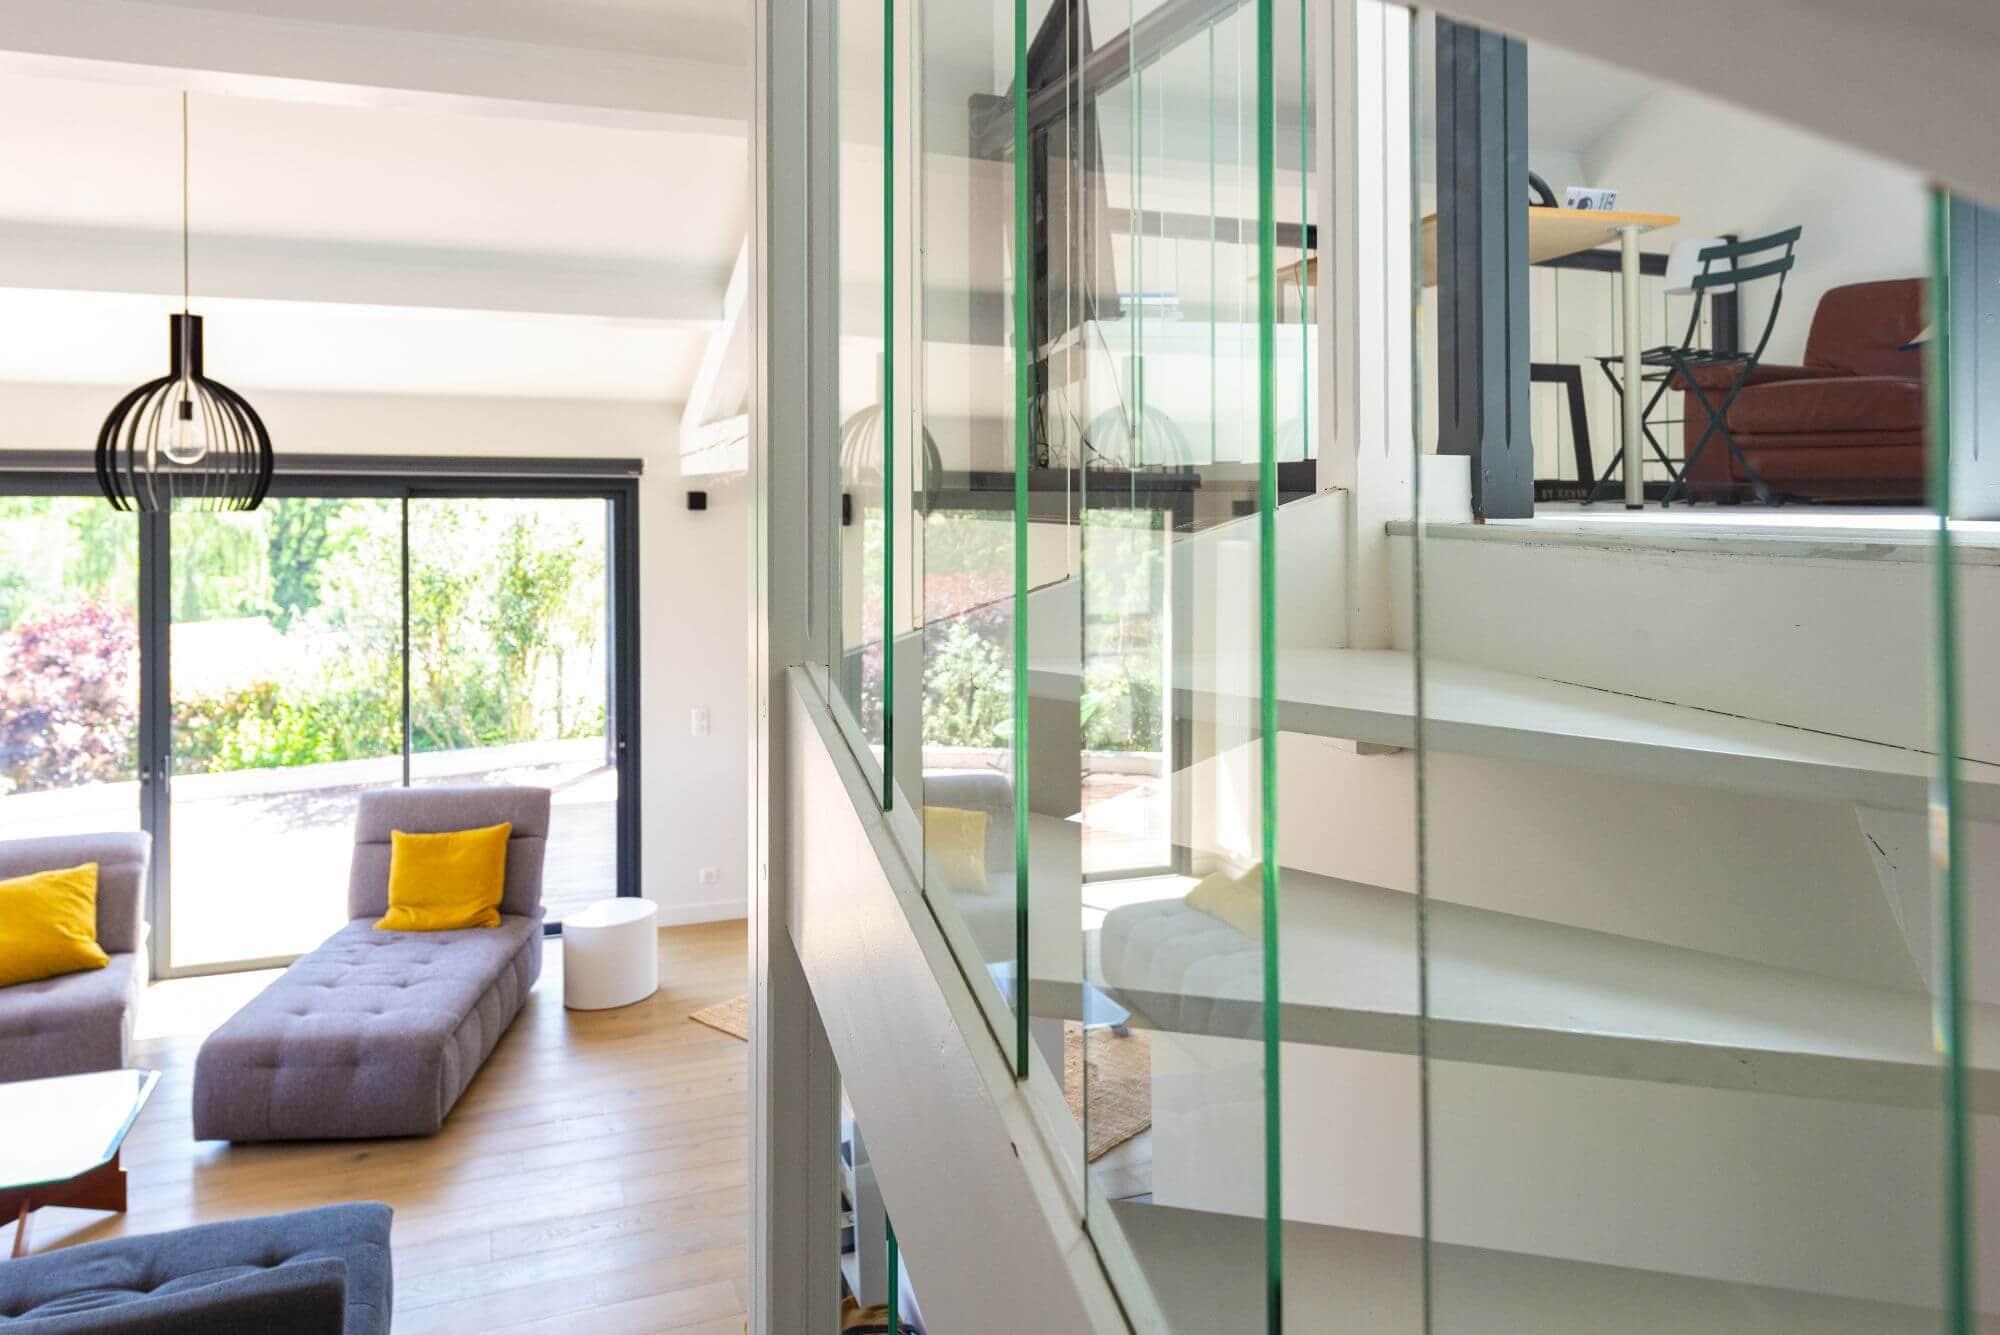 Escalier, Renovation